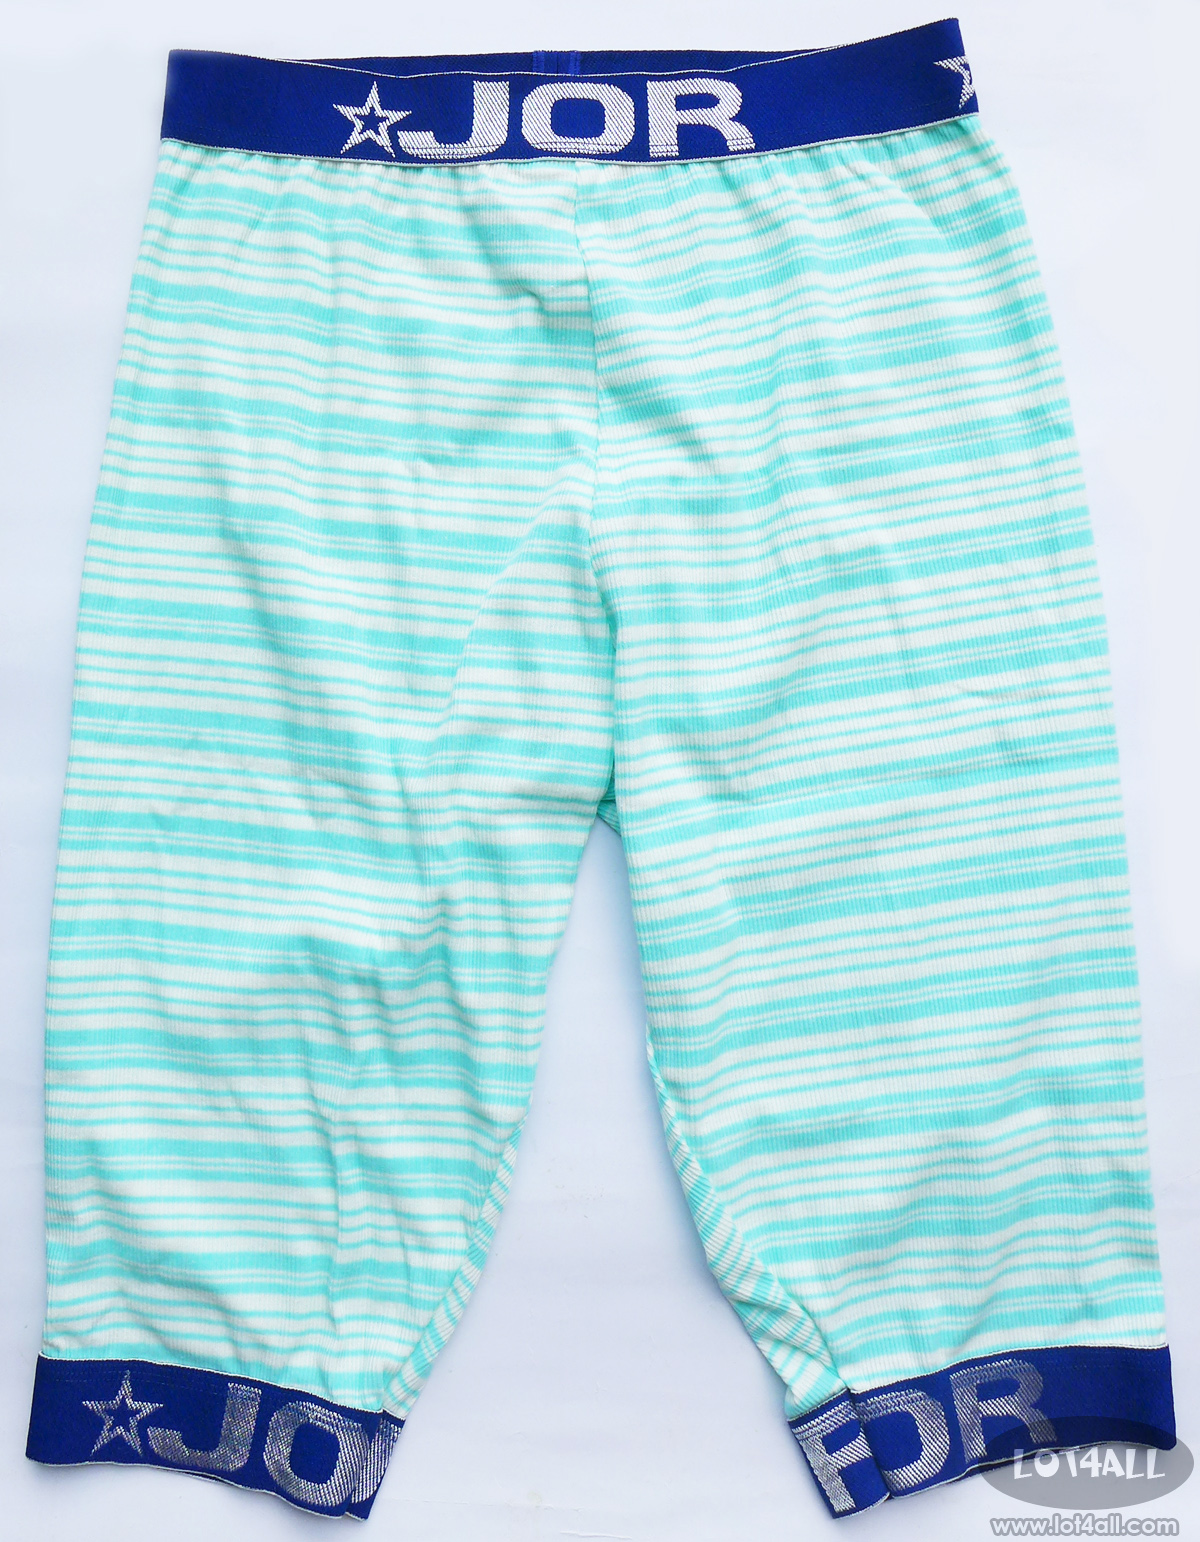 Quần nam JOR 0103 Yoga Loungewear Color Turquoise